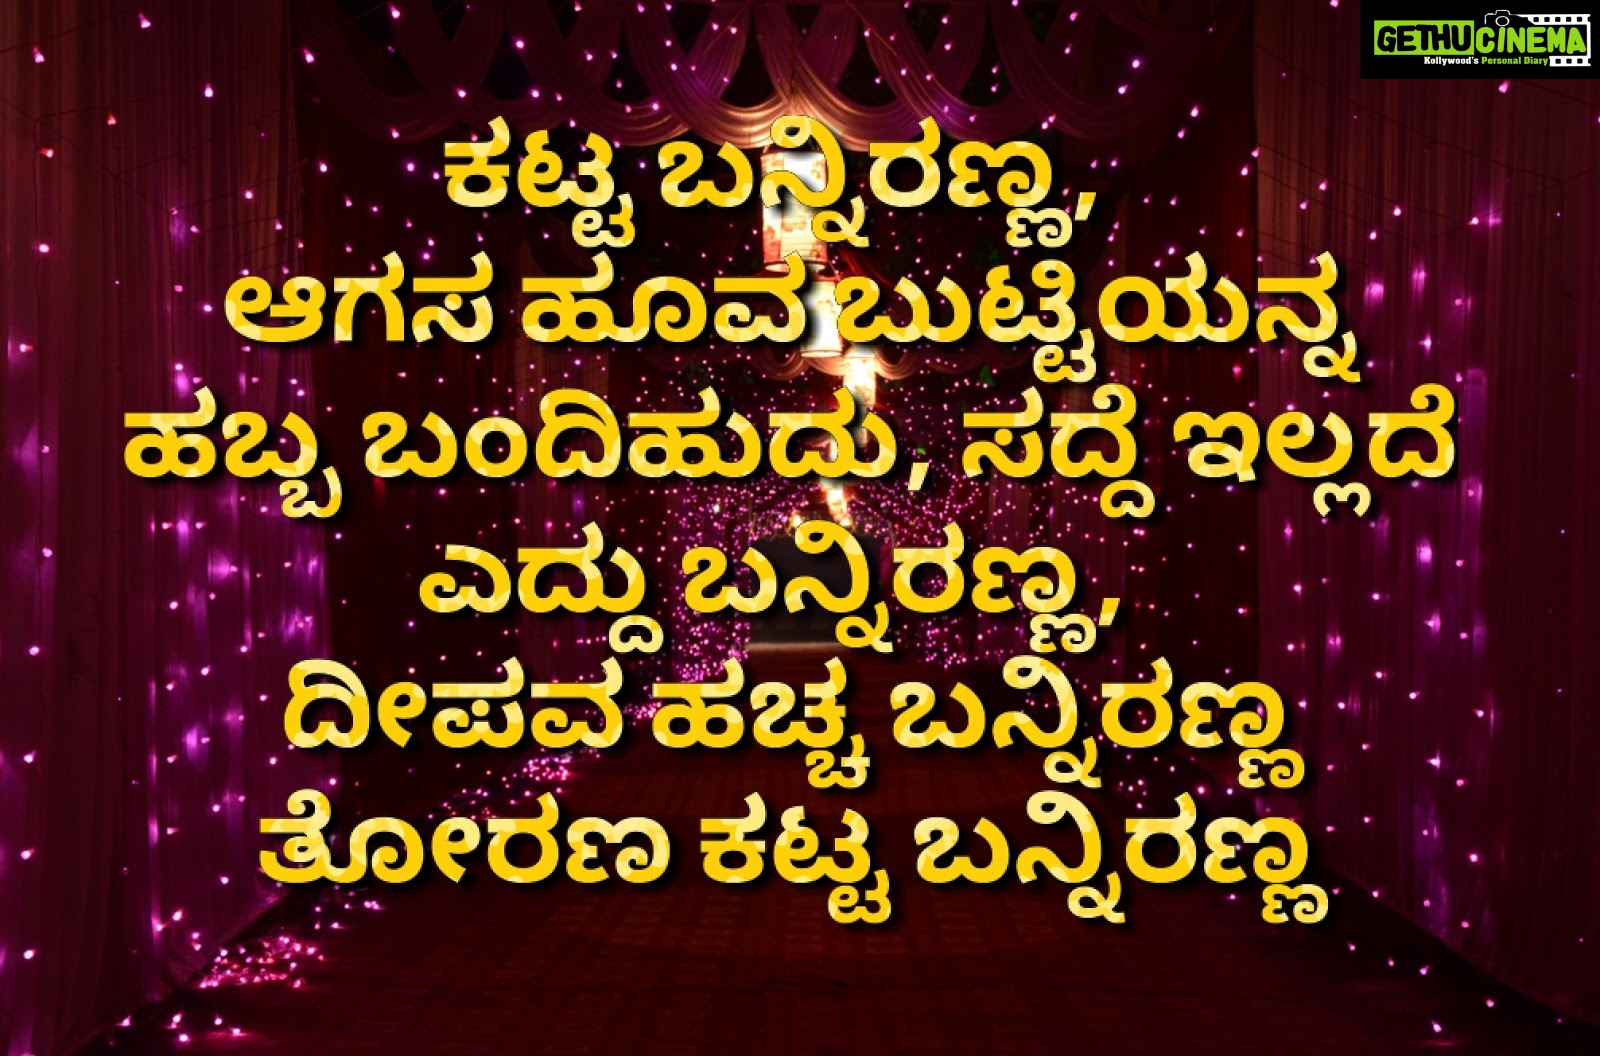 Diwali Quotes In Kannada Twitter thumbnail